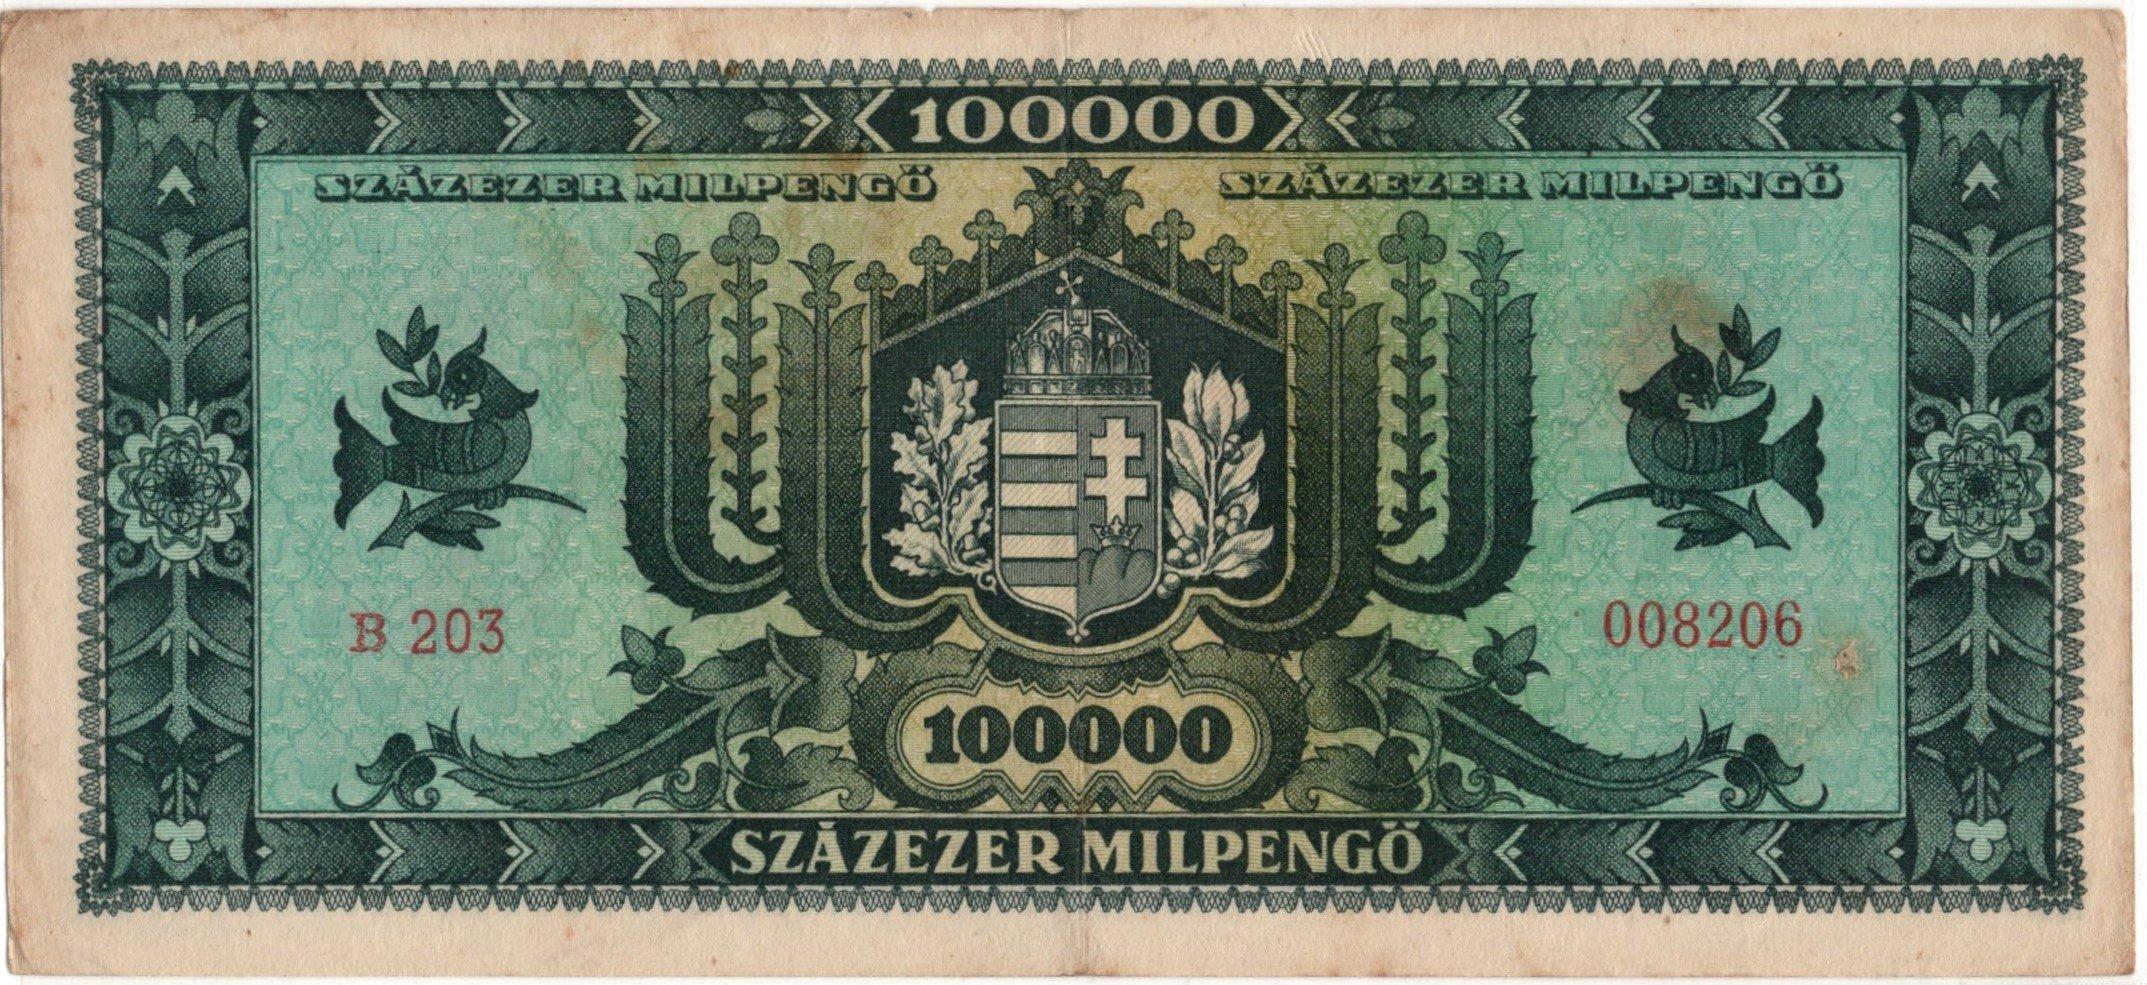 Hungary 100000 pengo 1946 back